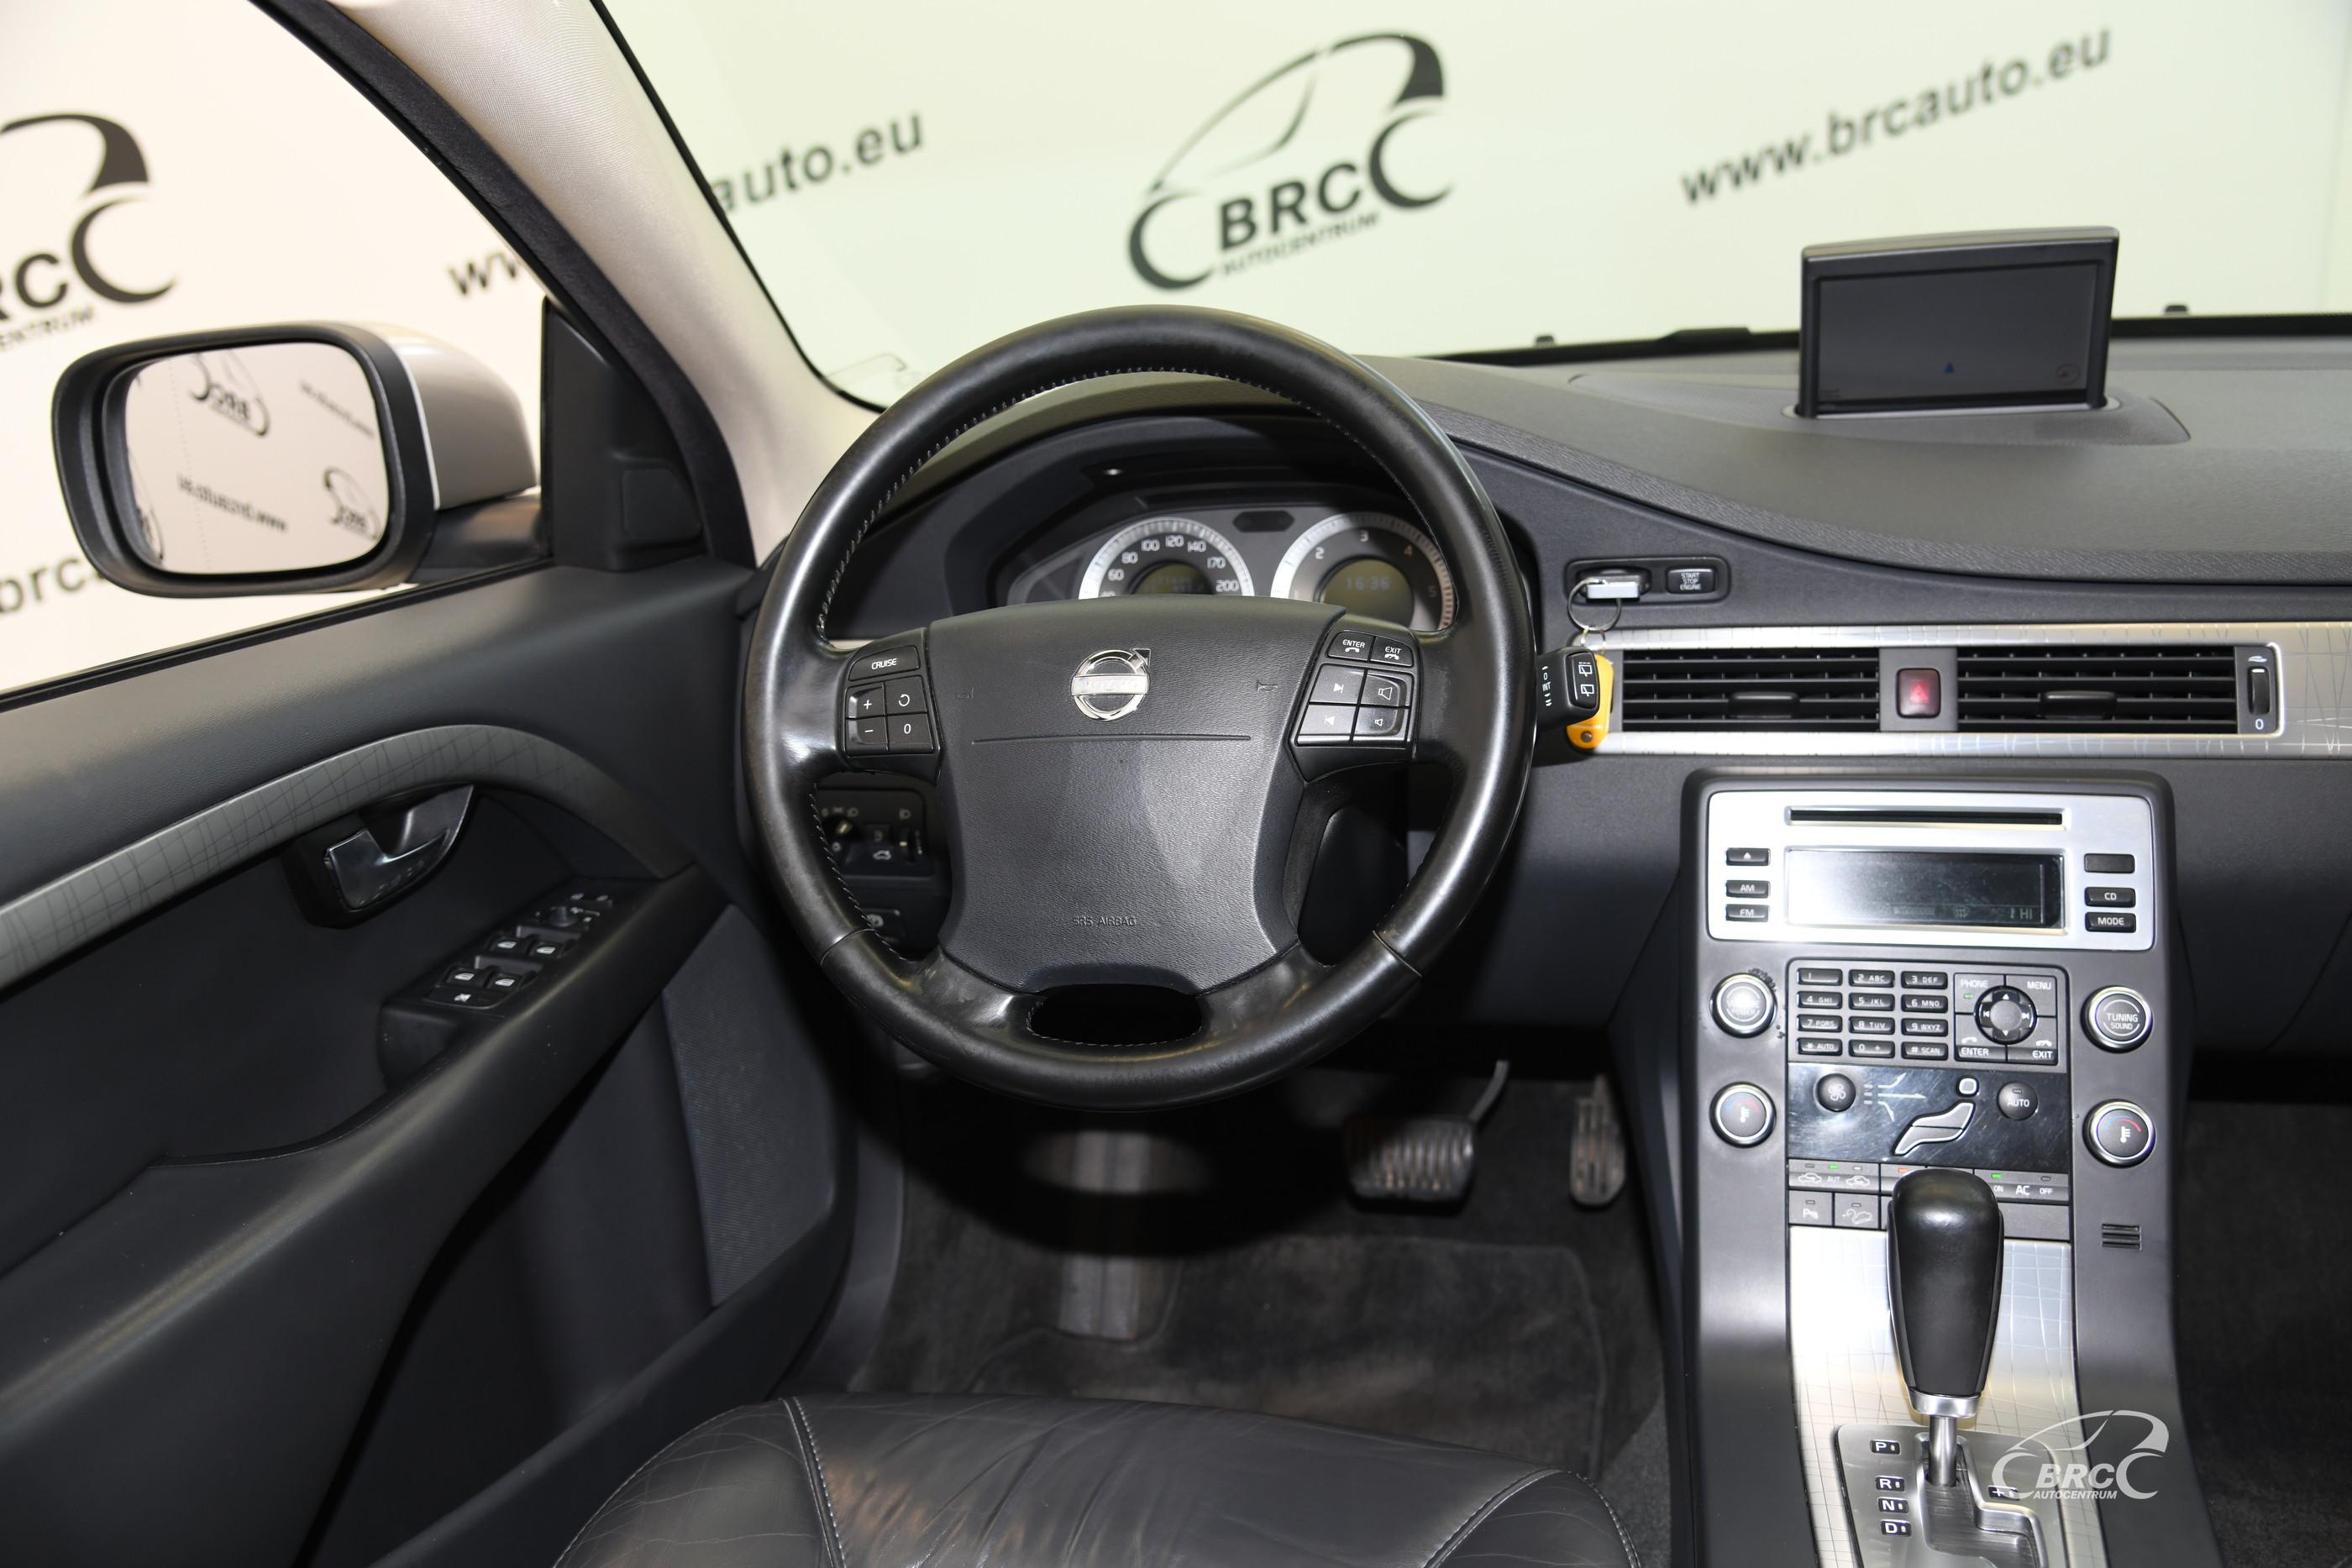 Volvo XC 70 D5 AWD Automatas